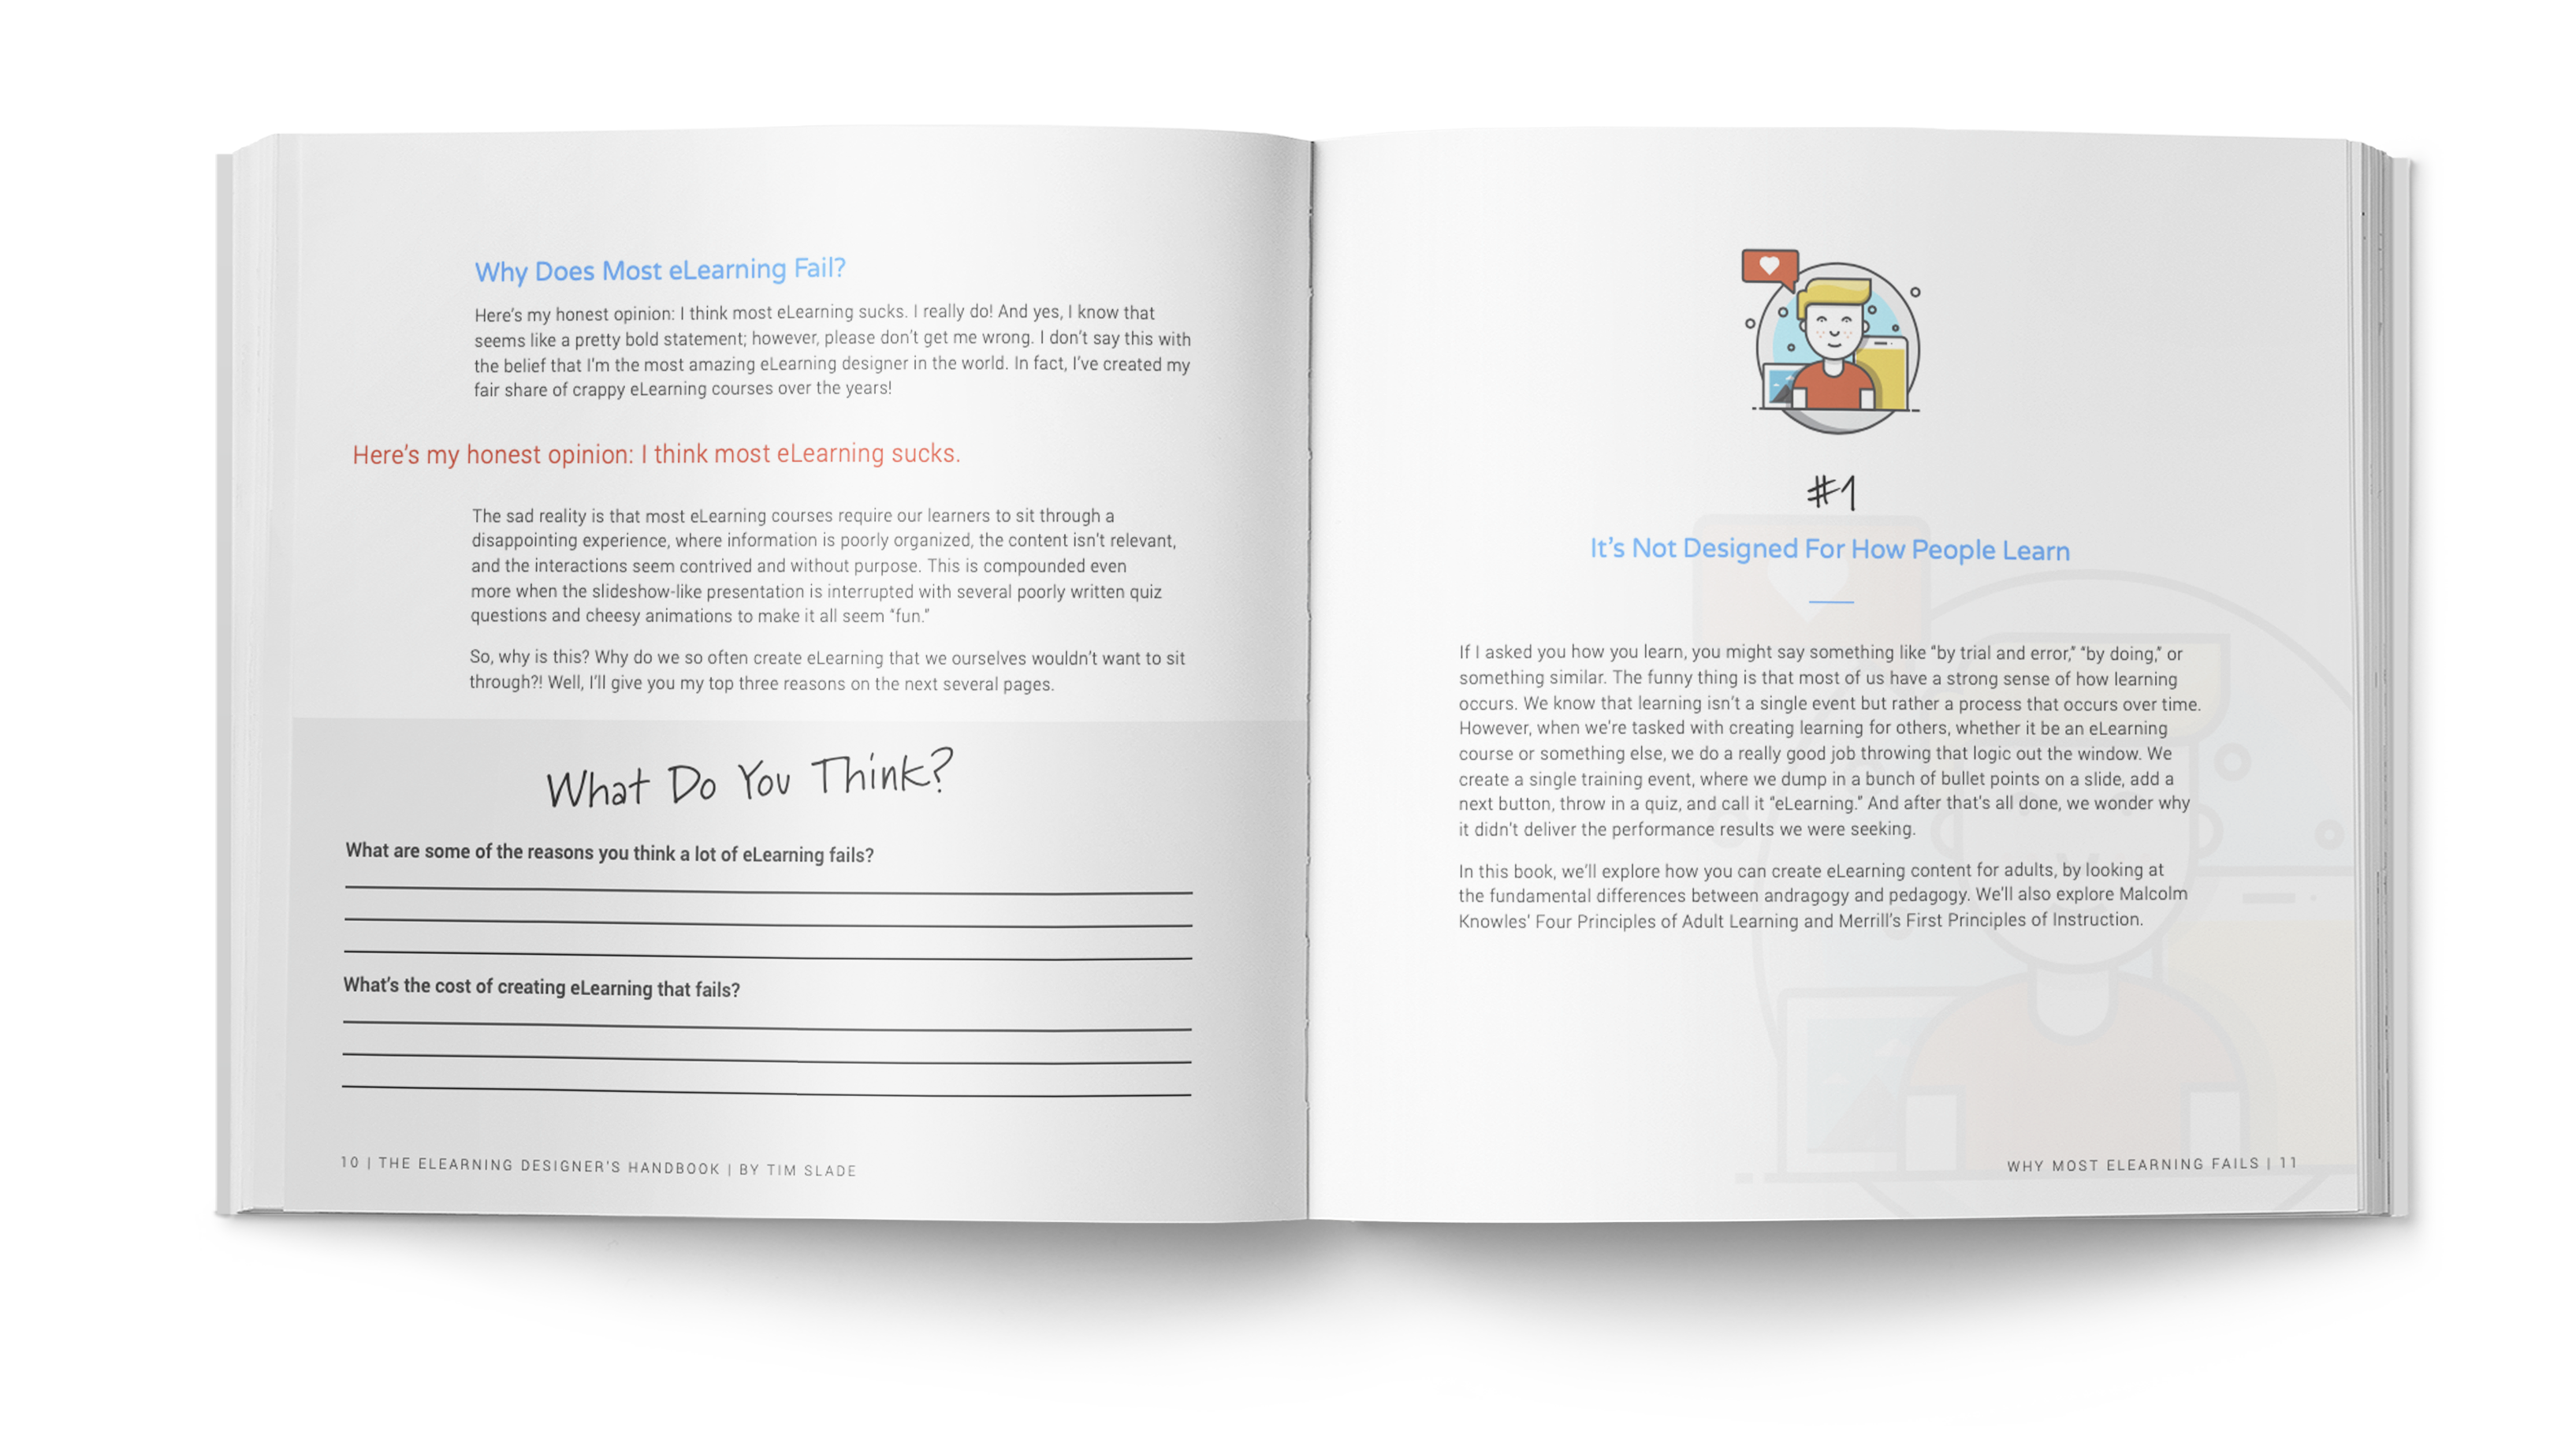 The eLearning Designer's Handbook by Tim Slade   Why Most eLearning Fails   Freelance eLearning Designer   The eLearning Designer's Academy